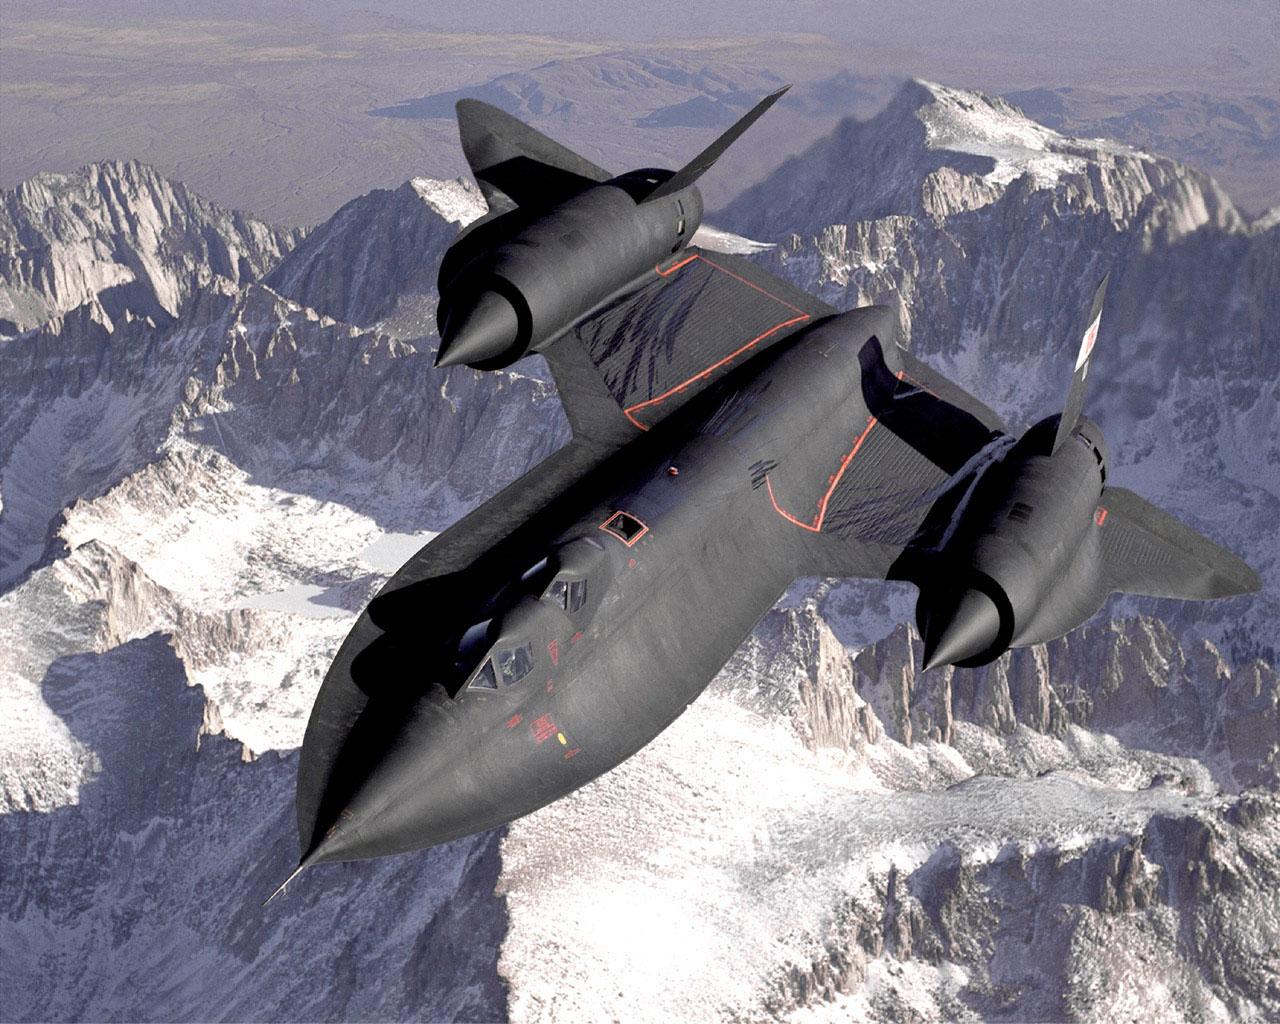 lockheed SR-71 flying above mountains